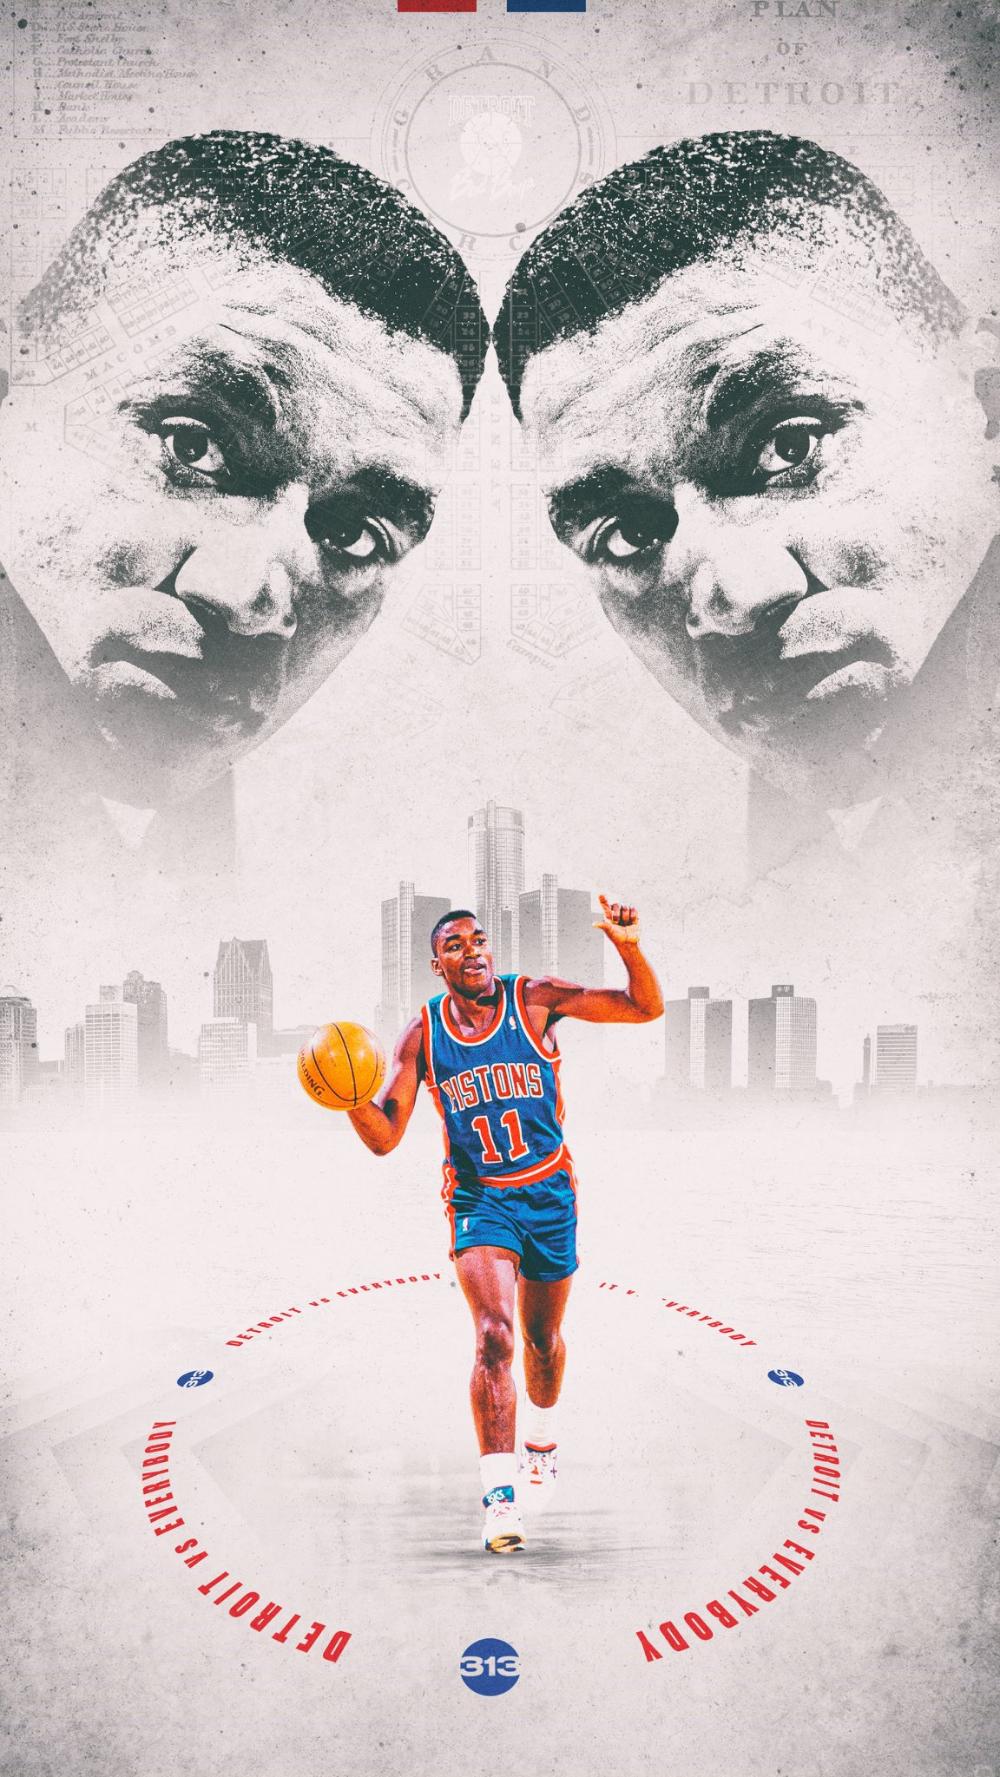 Juke on Twitter in 2020 Nba basketball art, Basketball